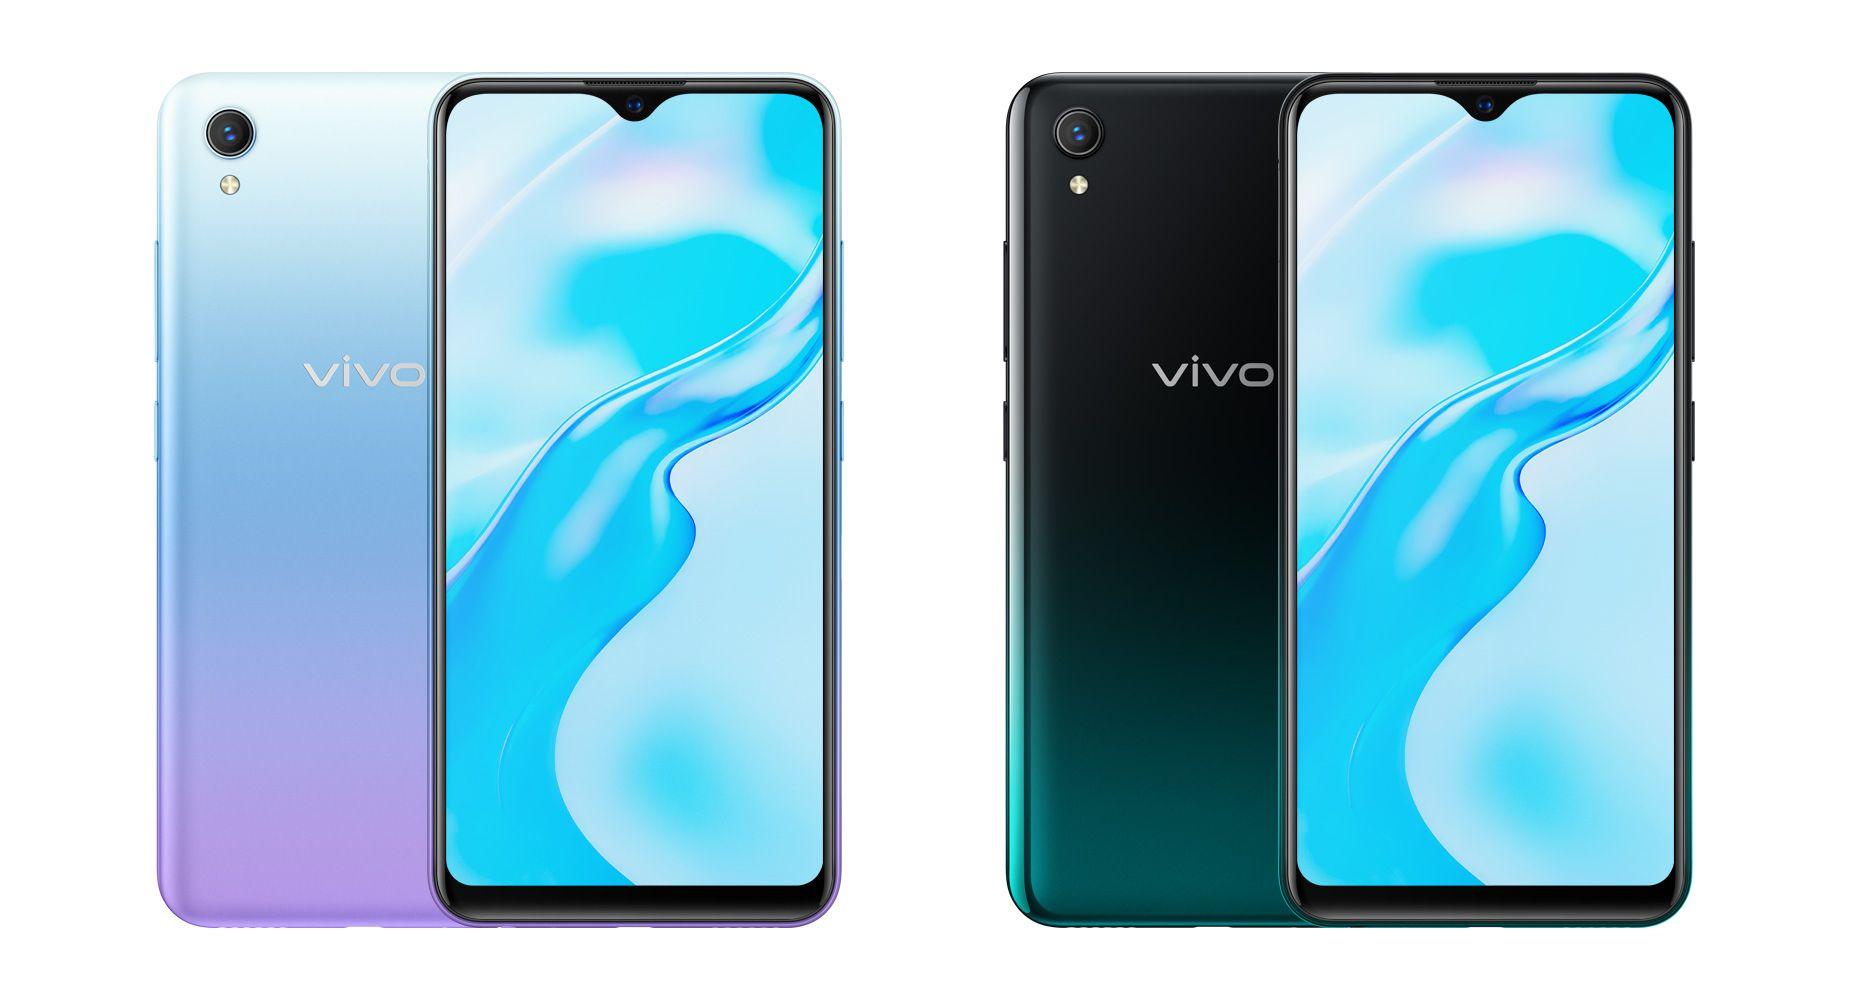 Представлен Vivo Y1s: 109 долларов забольшой дисплей, Helio P35 ибатарею на4030 мАч